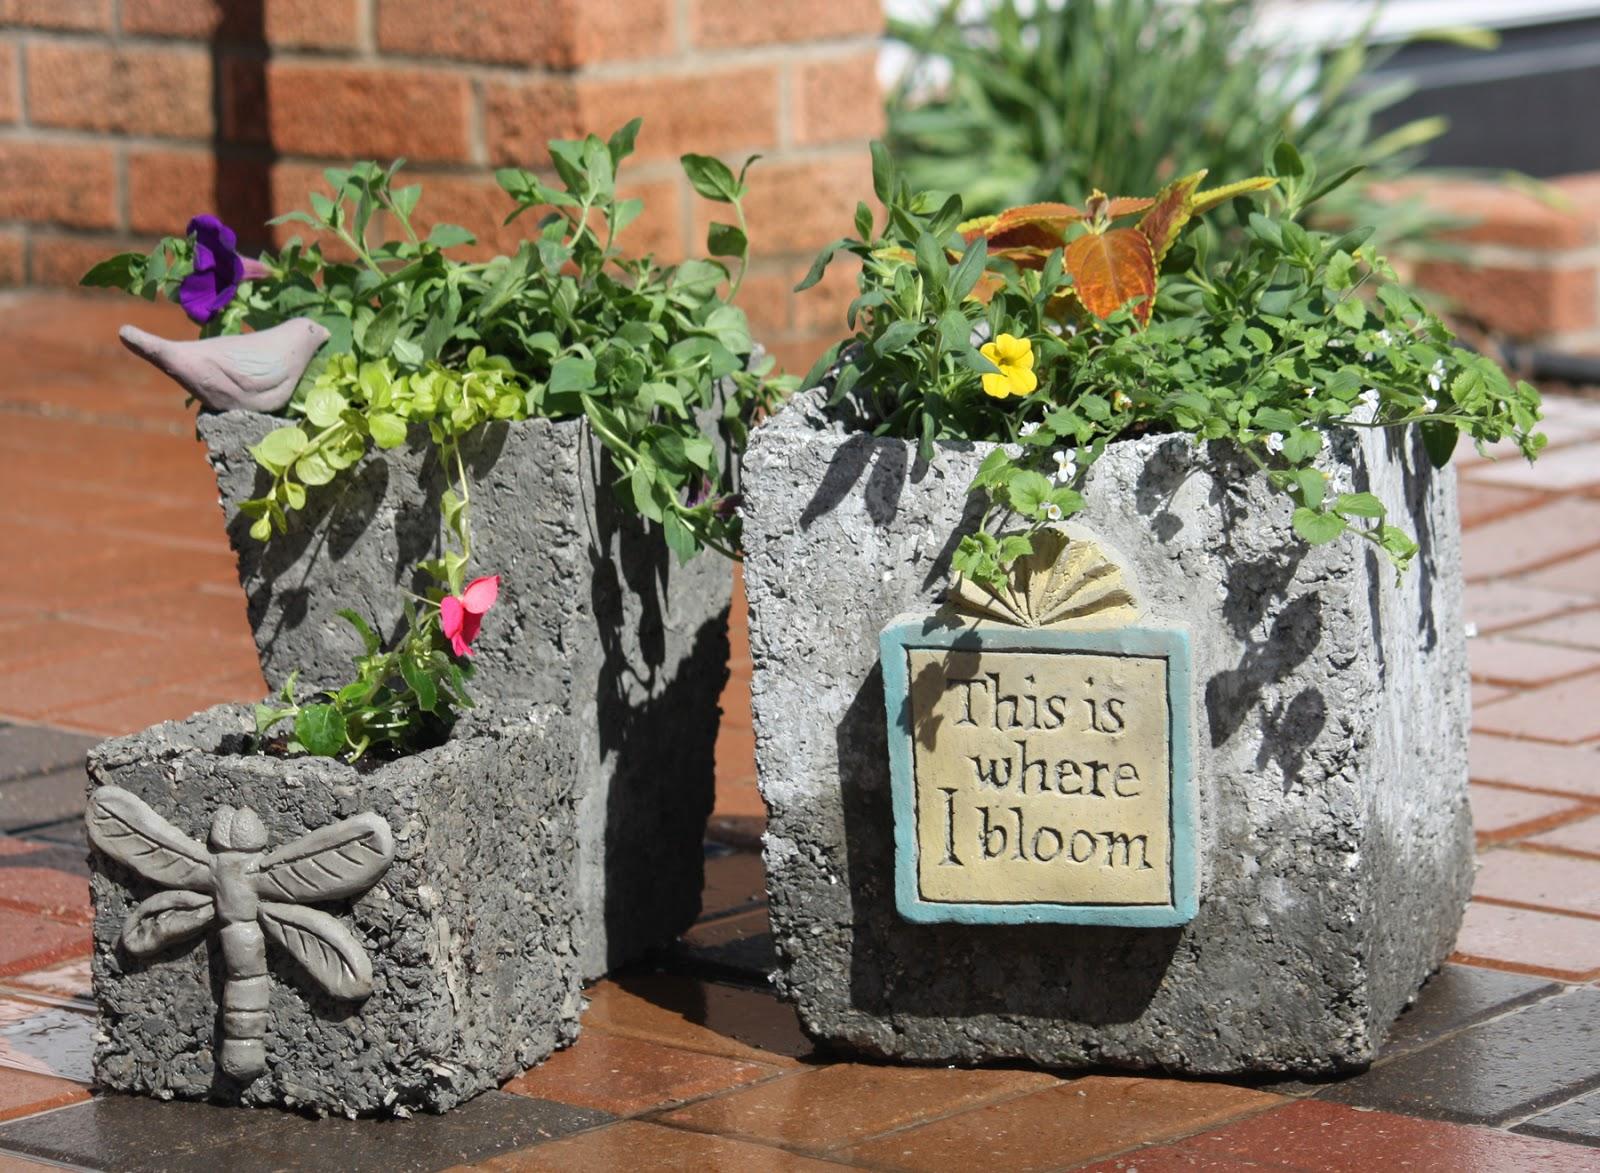 from the summer's garden: need graduation gift ideas? go creative